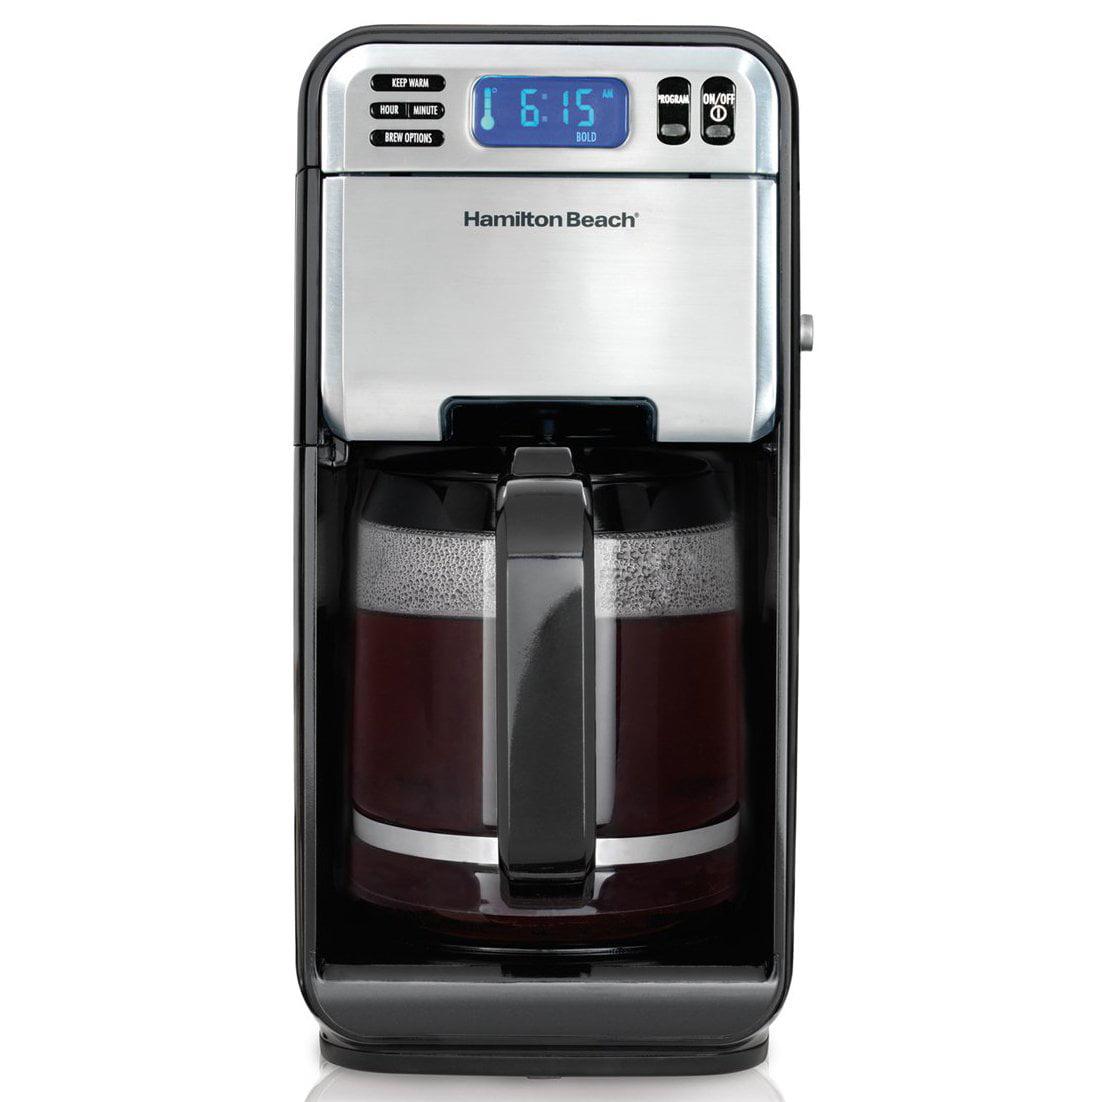 Hamilton Beach 12 Cup Digital Coffeemaker   Model# 46201